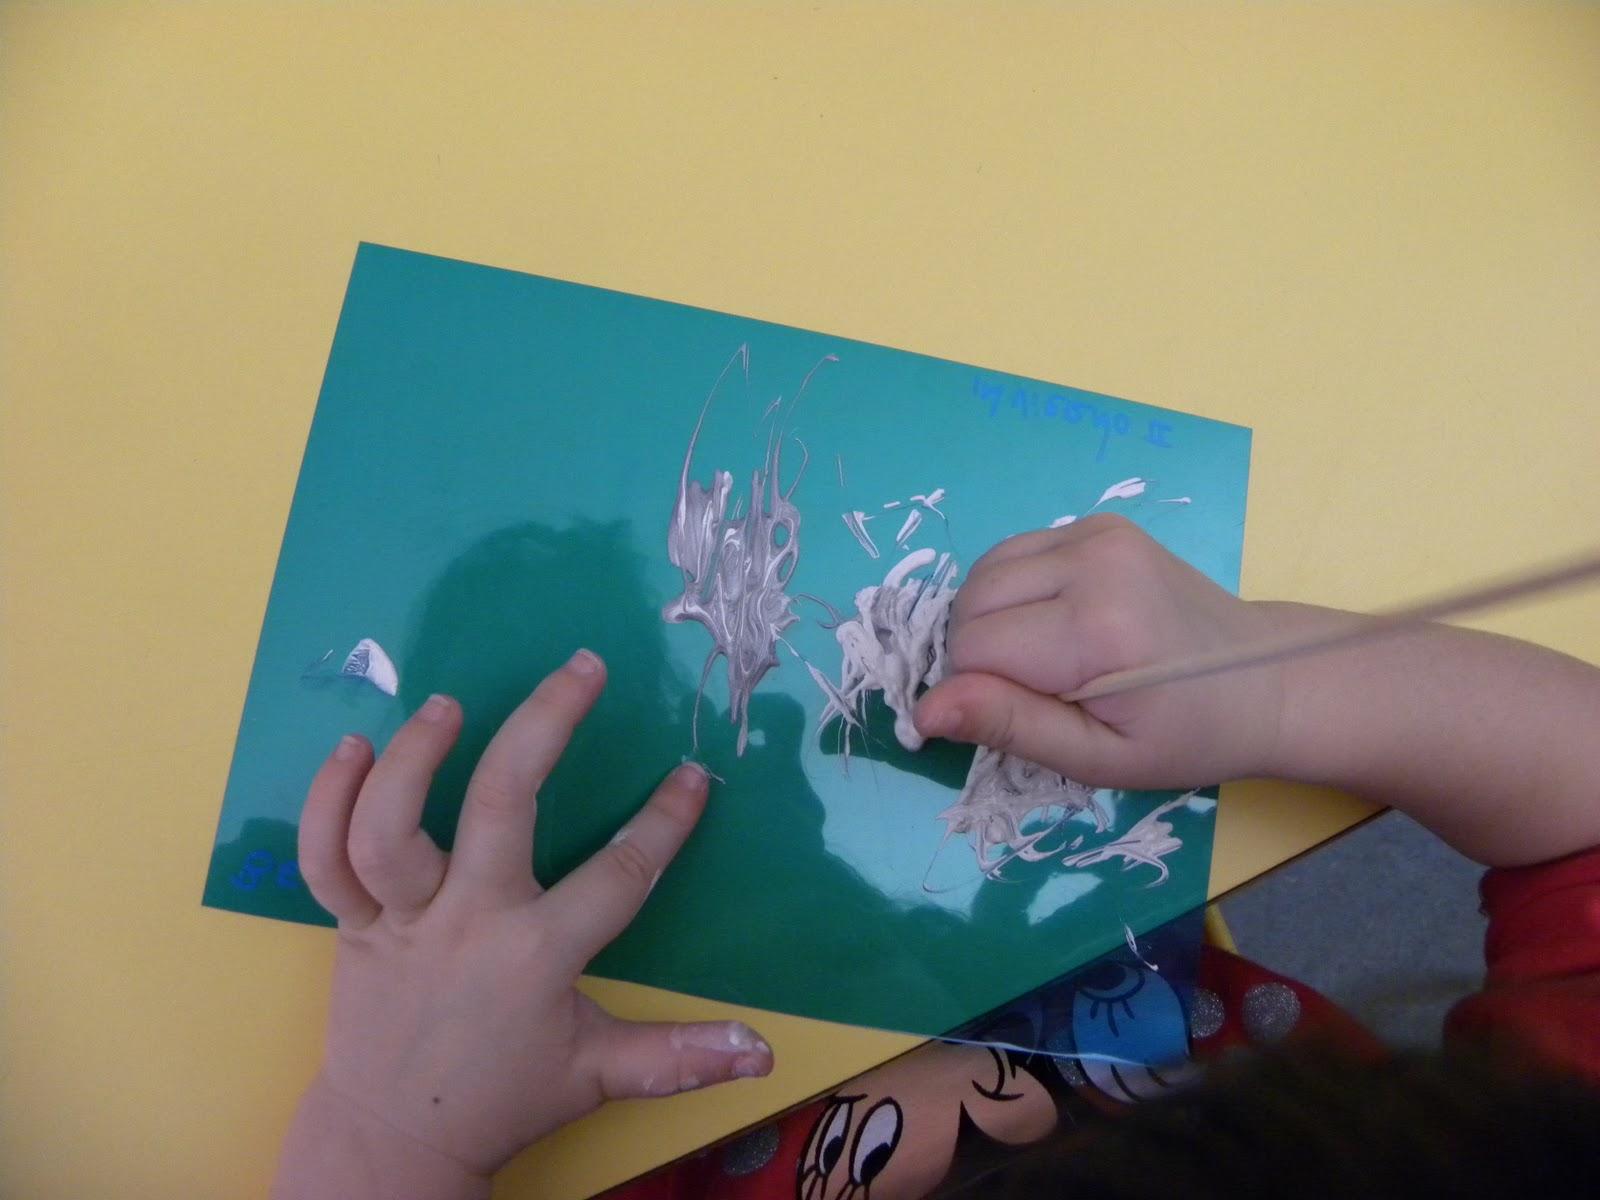 Aula de Sira Arte en acetatos Invierno